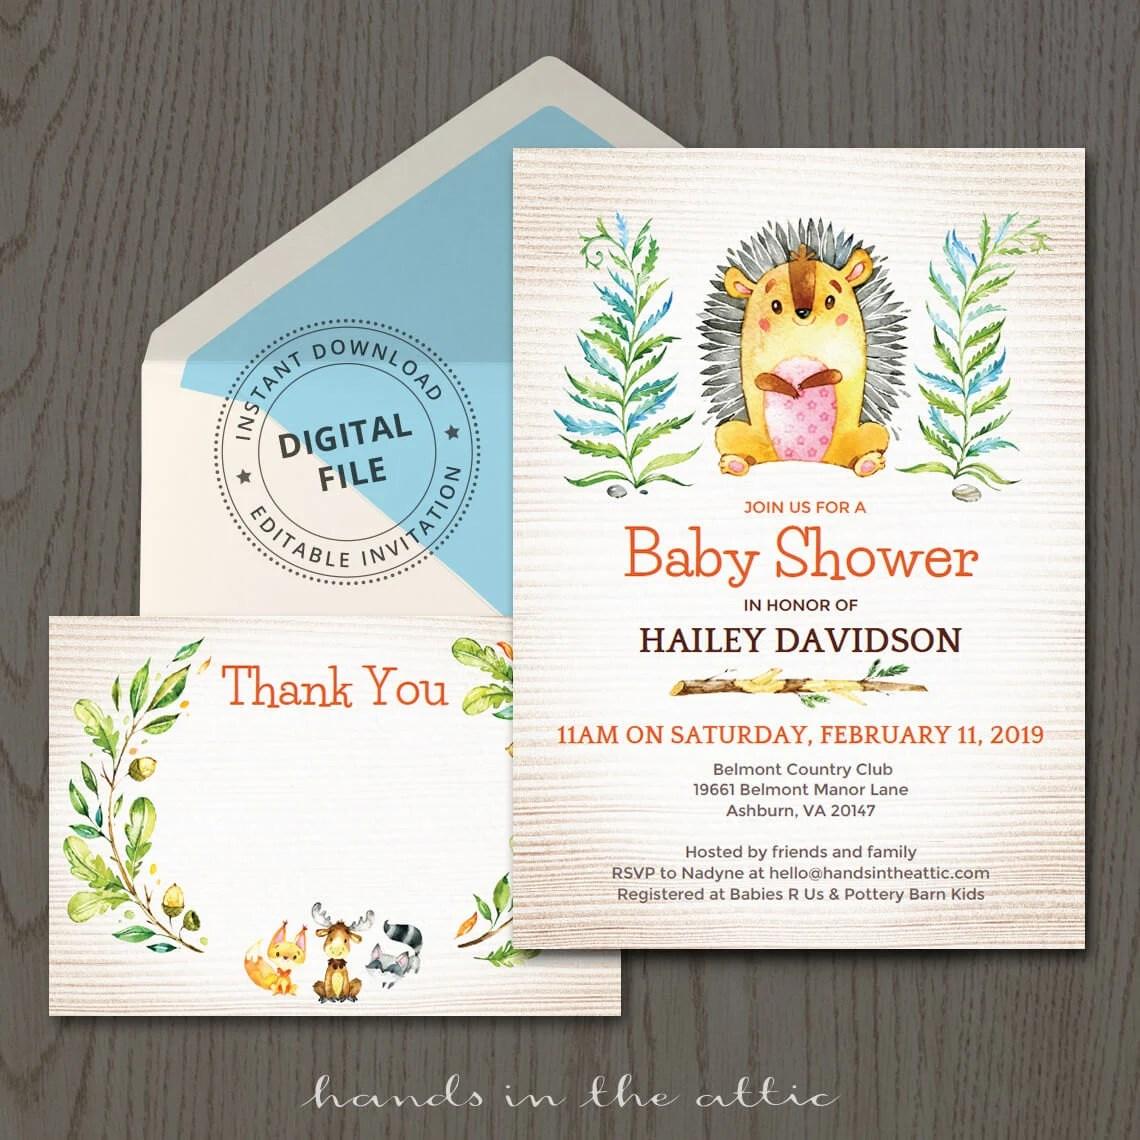 Woodland animals baby shower invitations, hedgehog, cute porcupine